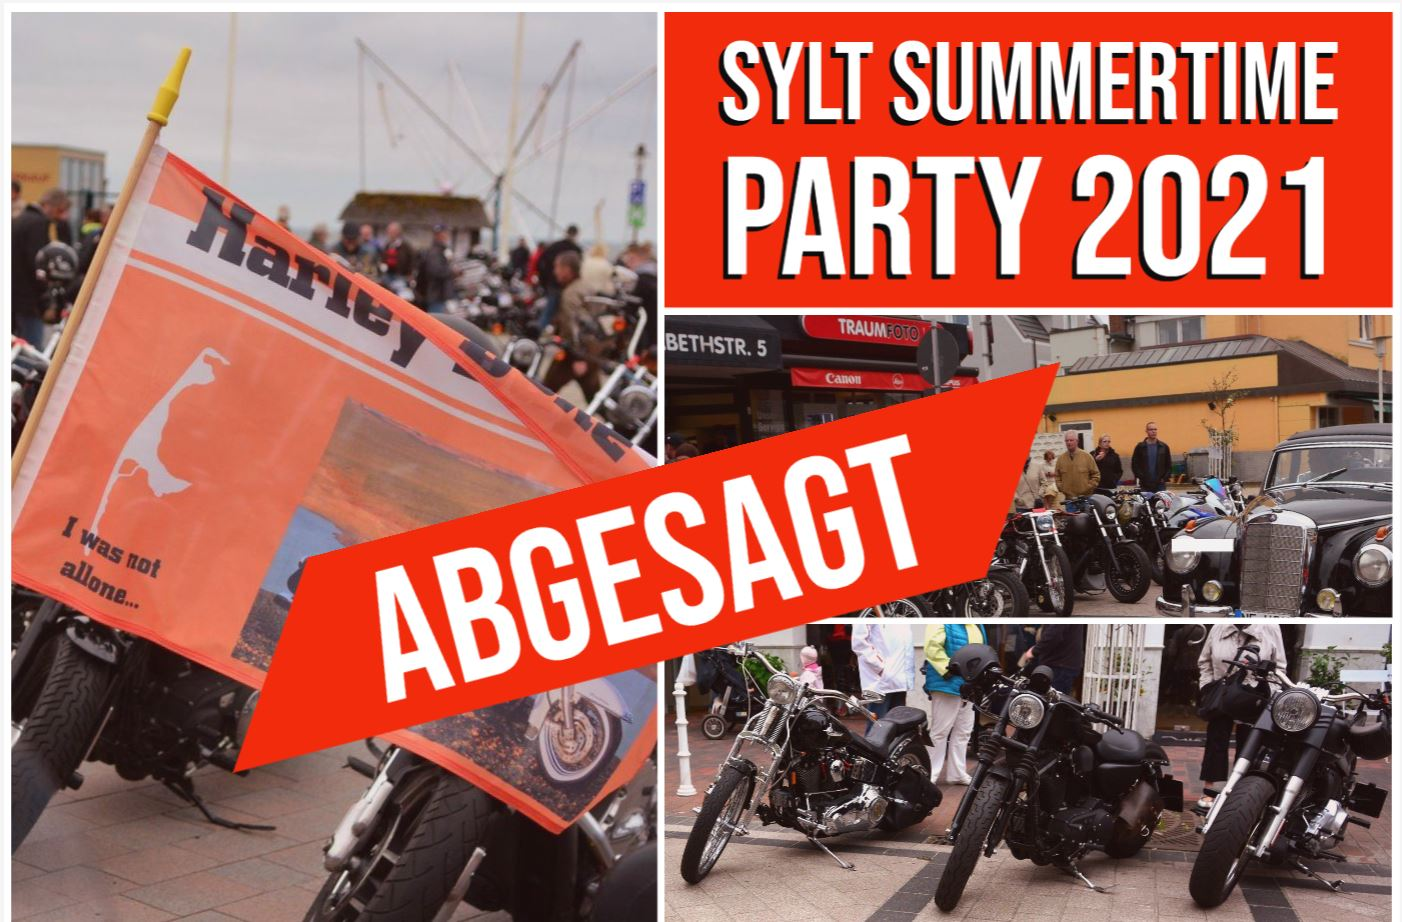 ABGESAGT – Sylt Summertime Party 2021